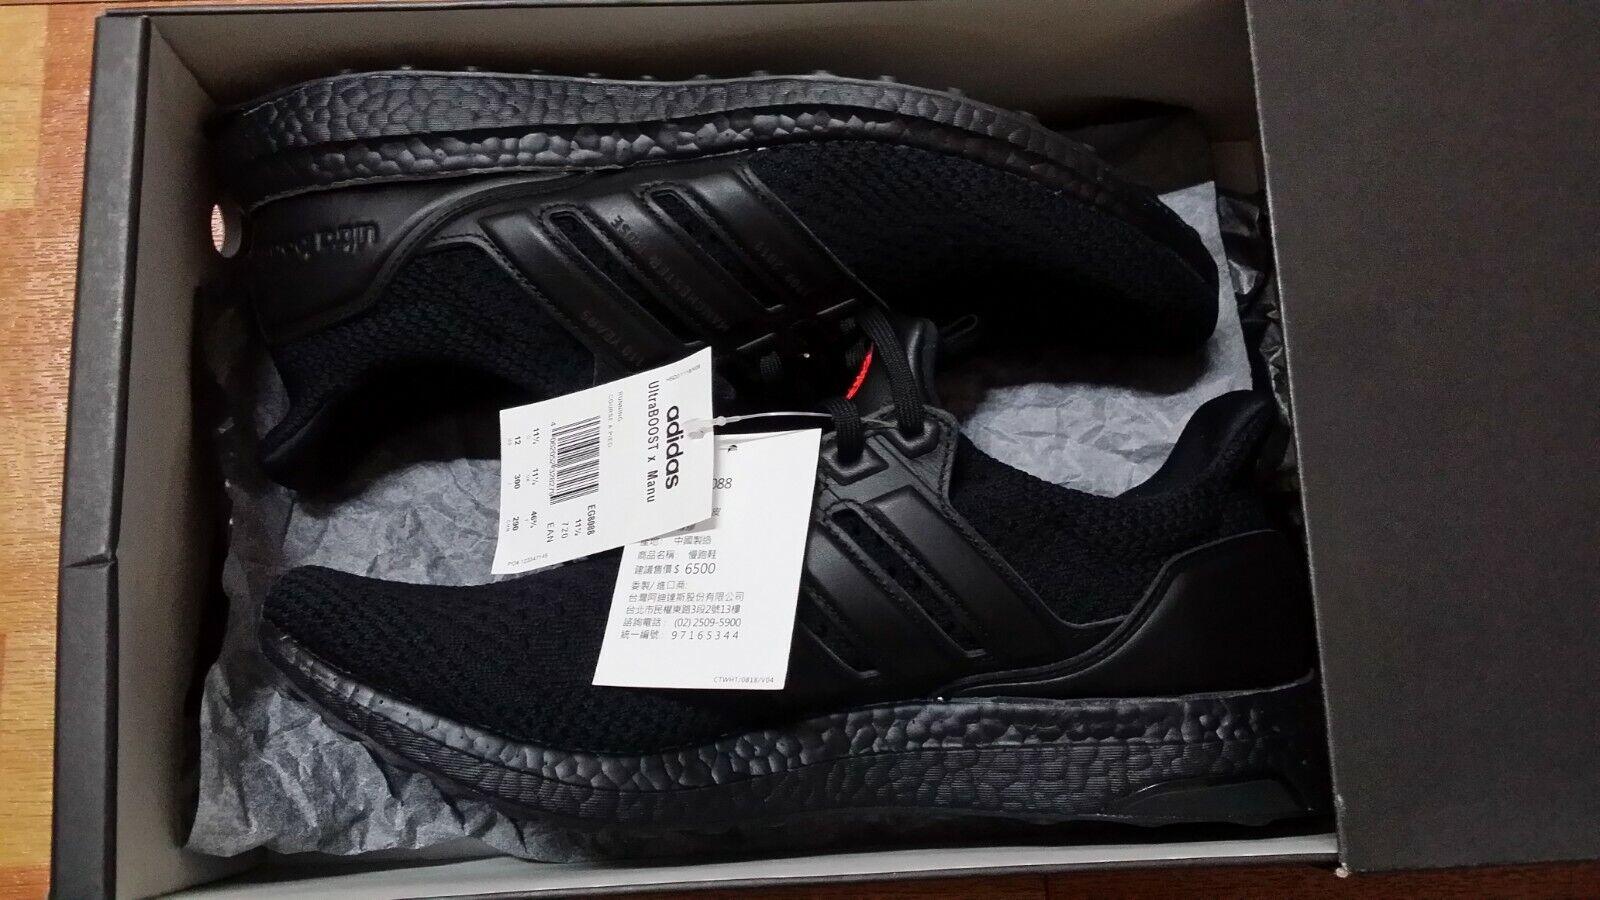 Adidas Ultraboost X Manu Fc Manchester United Rose Size 10 Men Shoes Eg8088 Nwb For Sale Online Ebay